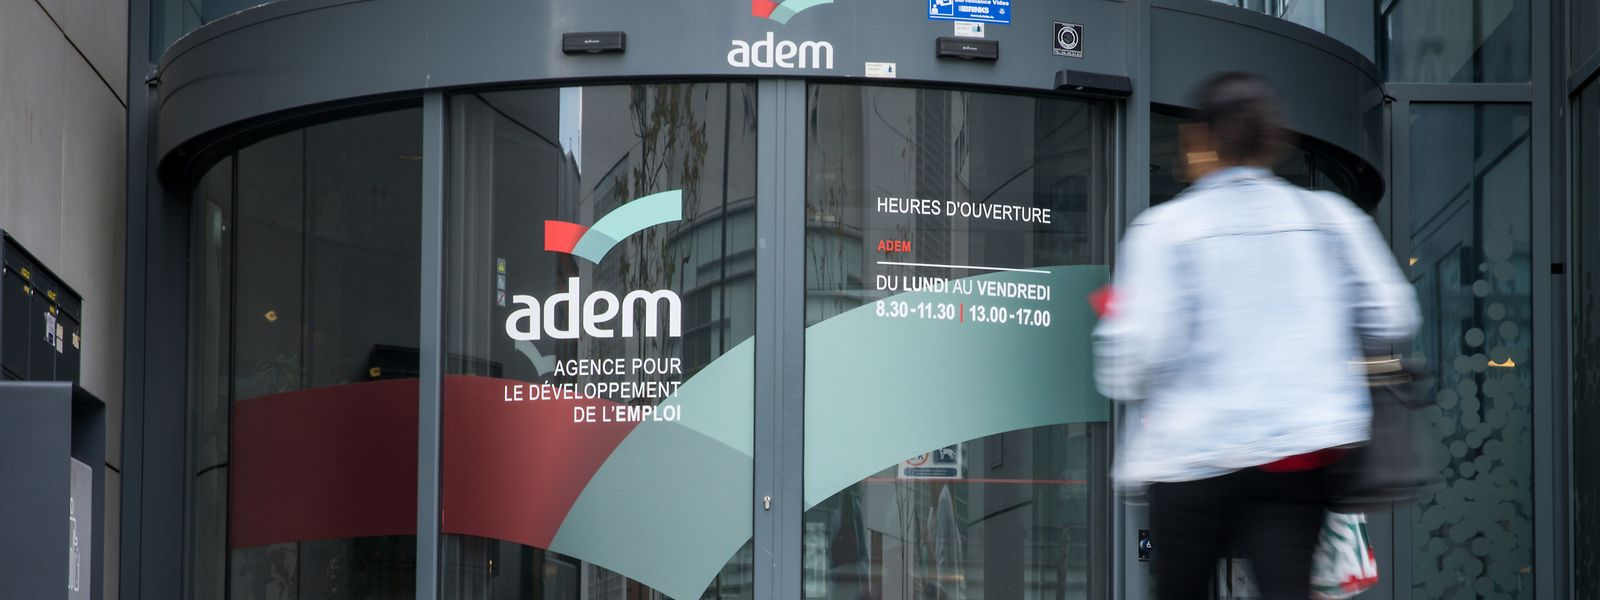 ADEM - Foto: Pierre Matgé/Luxemburger Wort